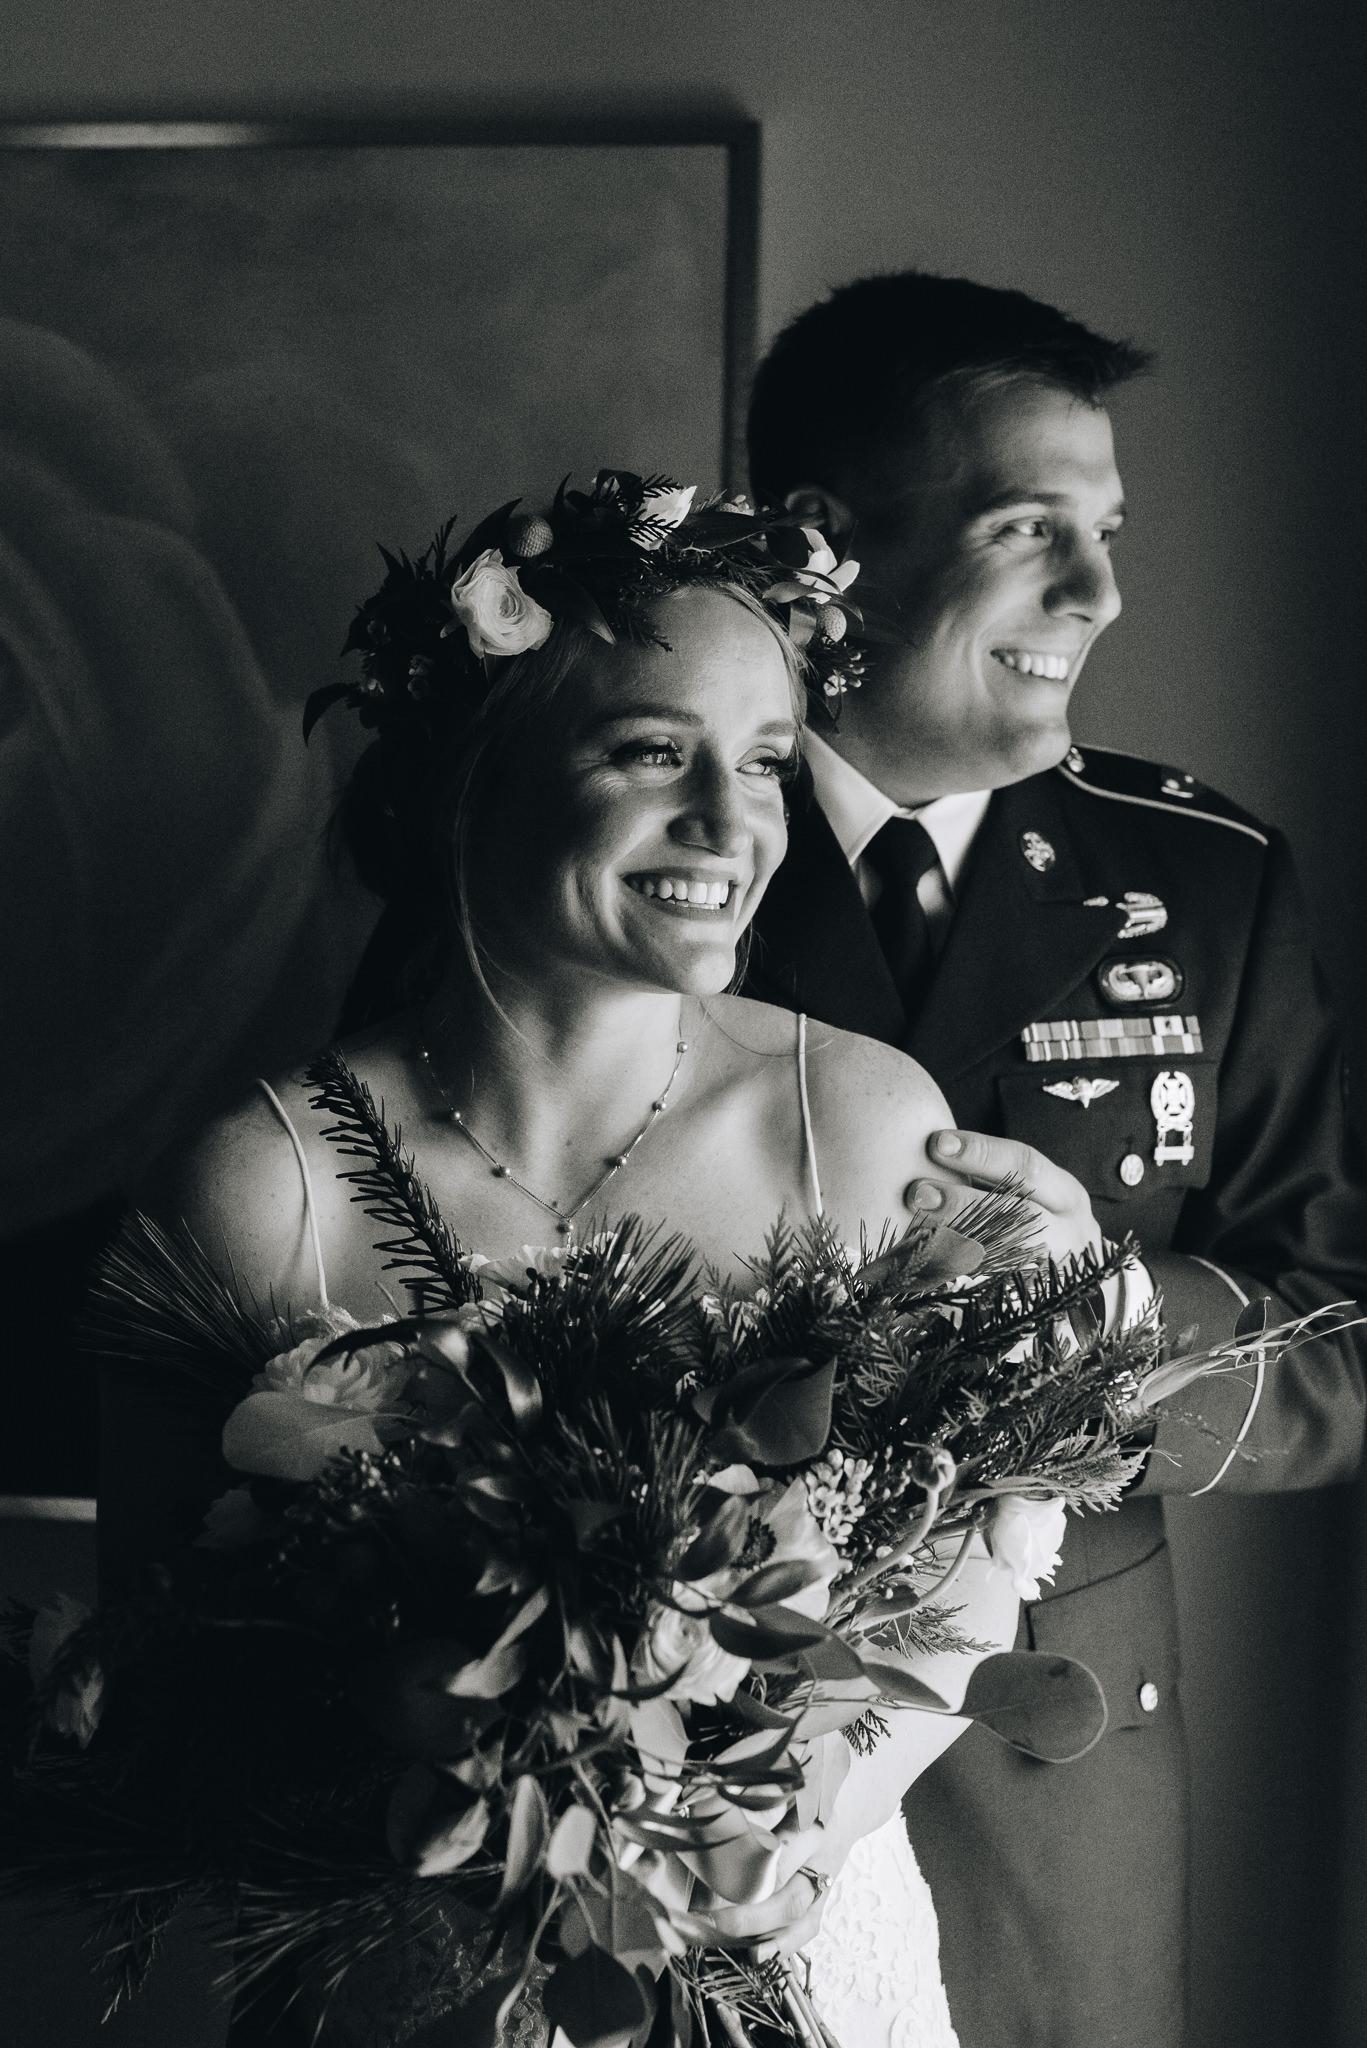 Trevor-Hooper-Wedding-Photographer-The-Bungalow-Wedding-Utah_BW_033.jpg